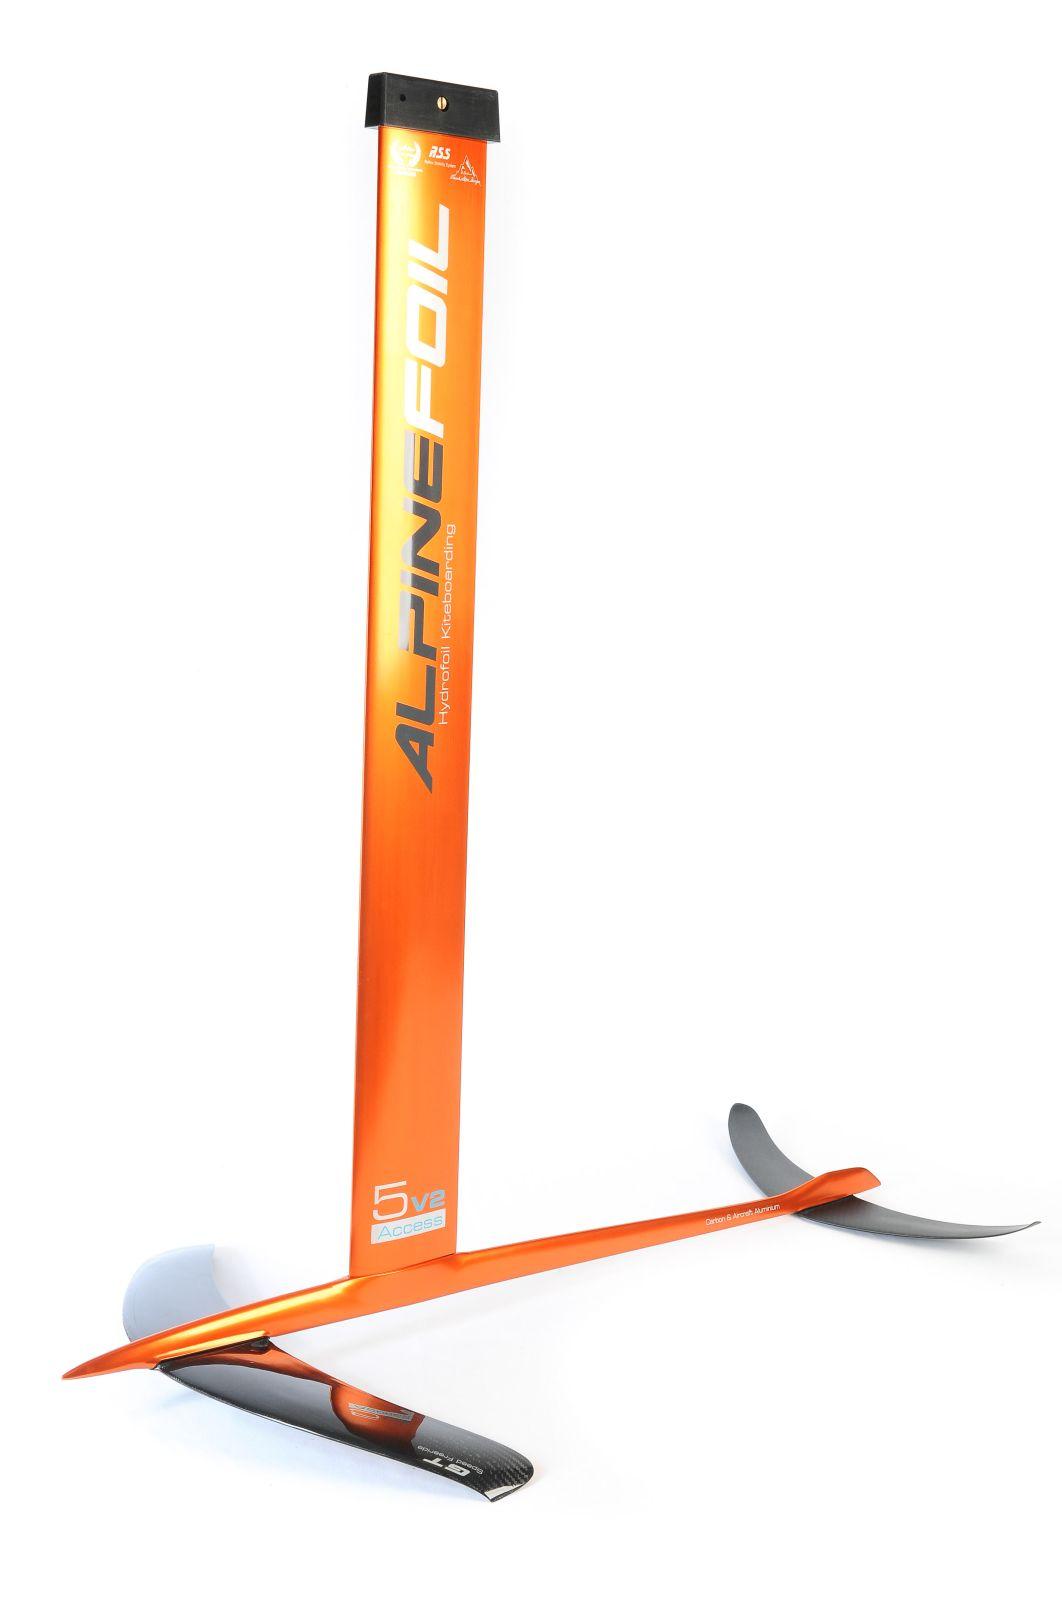 Kitefoil carbon aluminium alpinefoil 5 0 access v2 2486 1